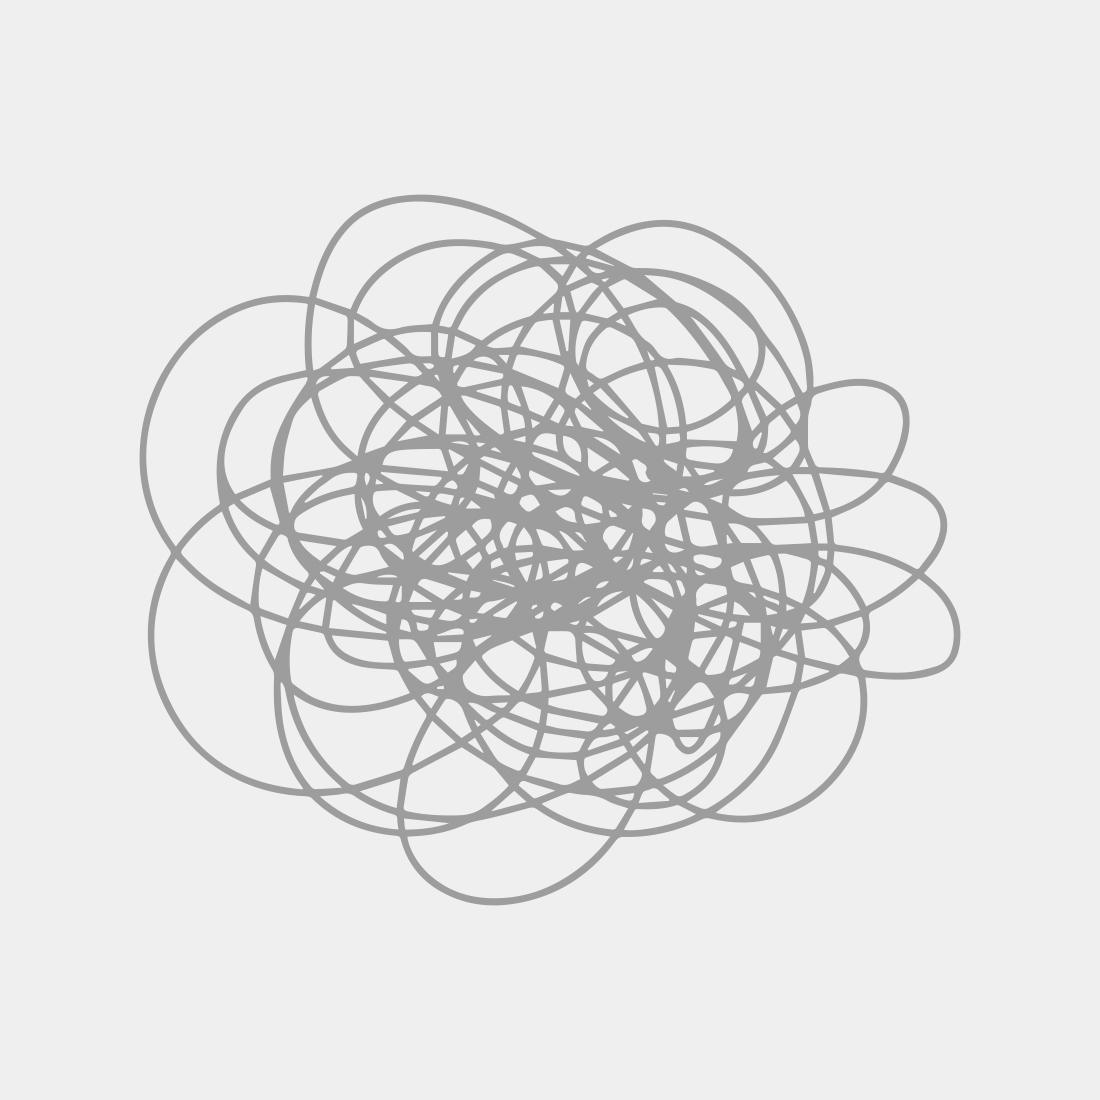 Leon Spilliaert Woman on a Stool Repro Print 35.5 x 28cm